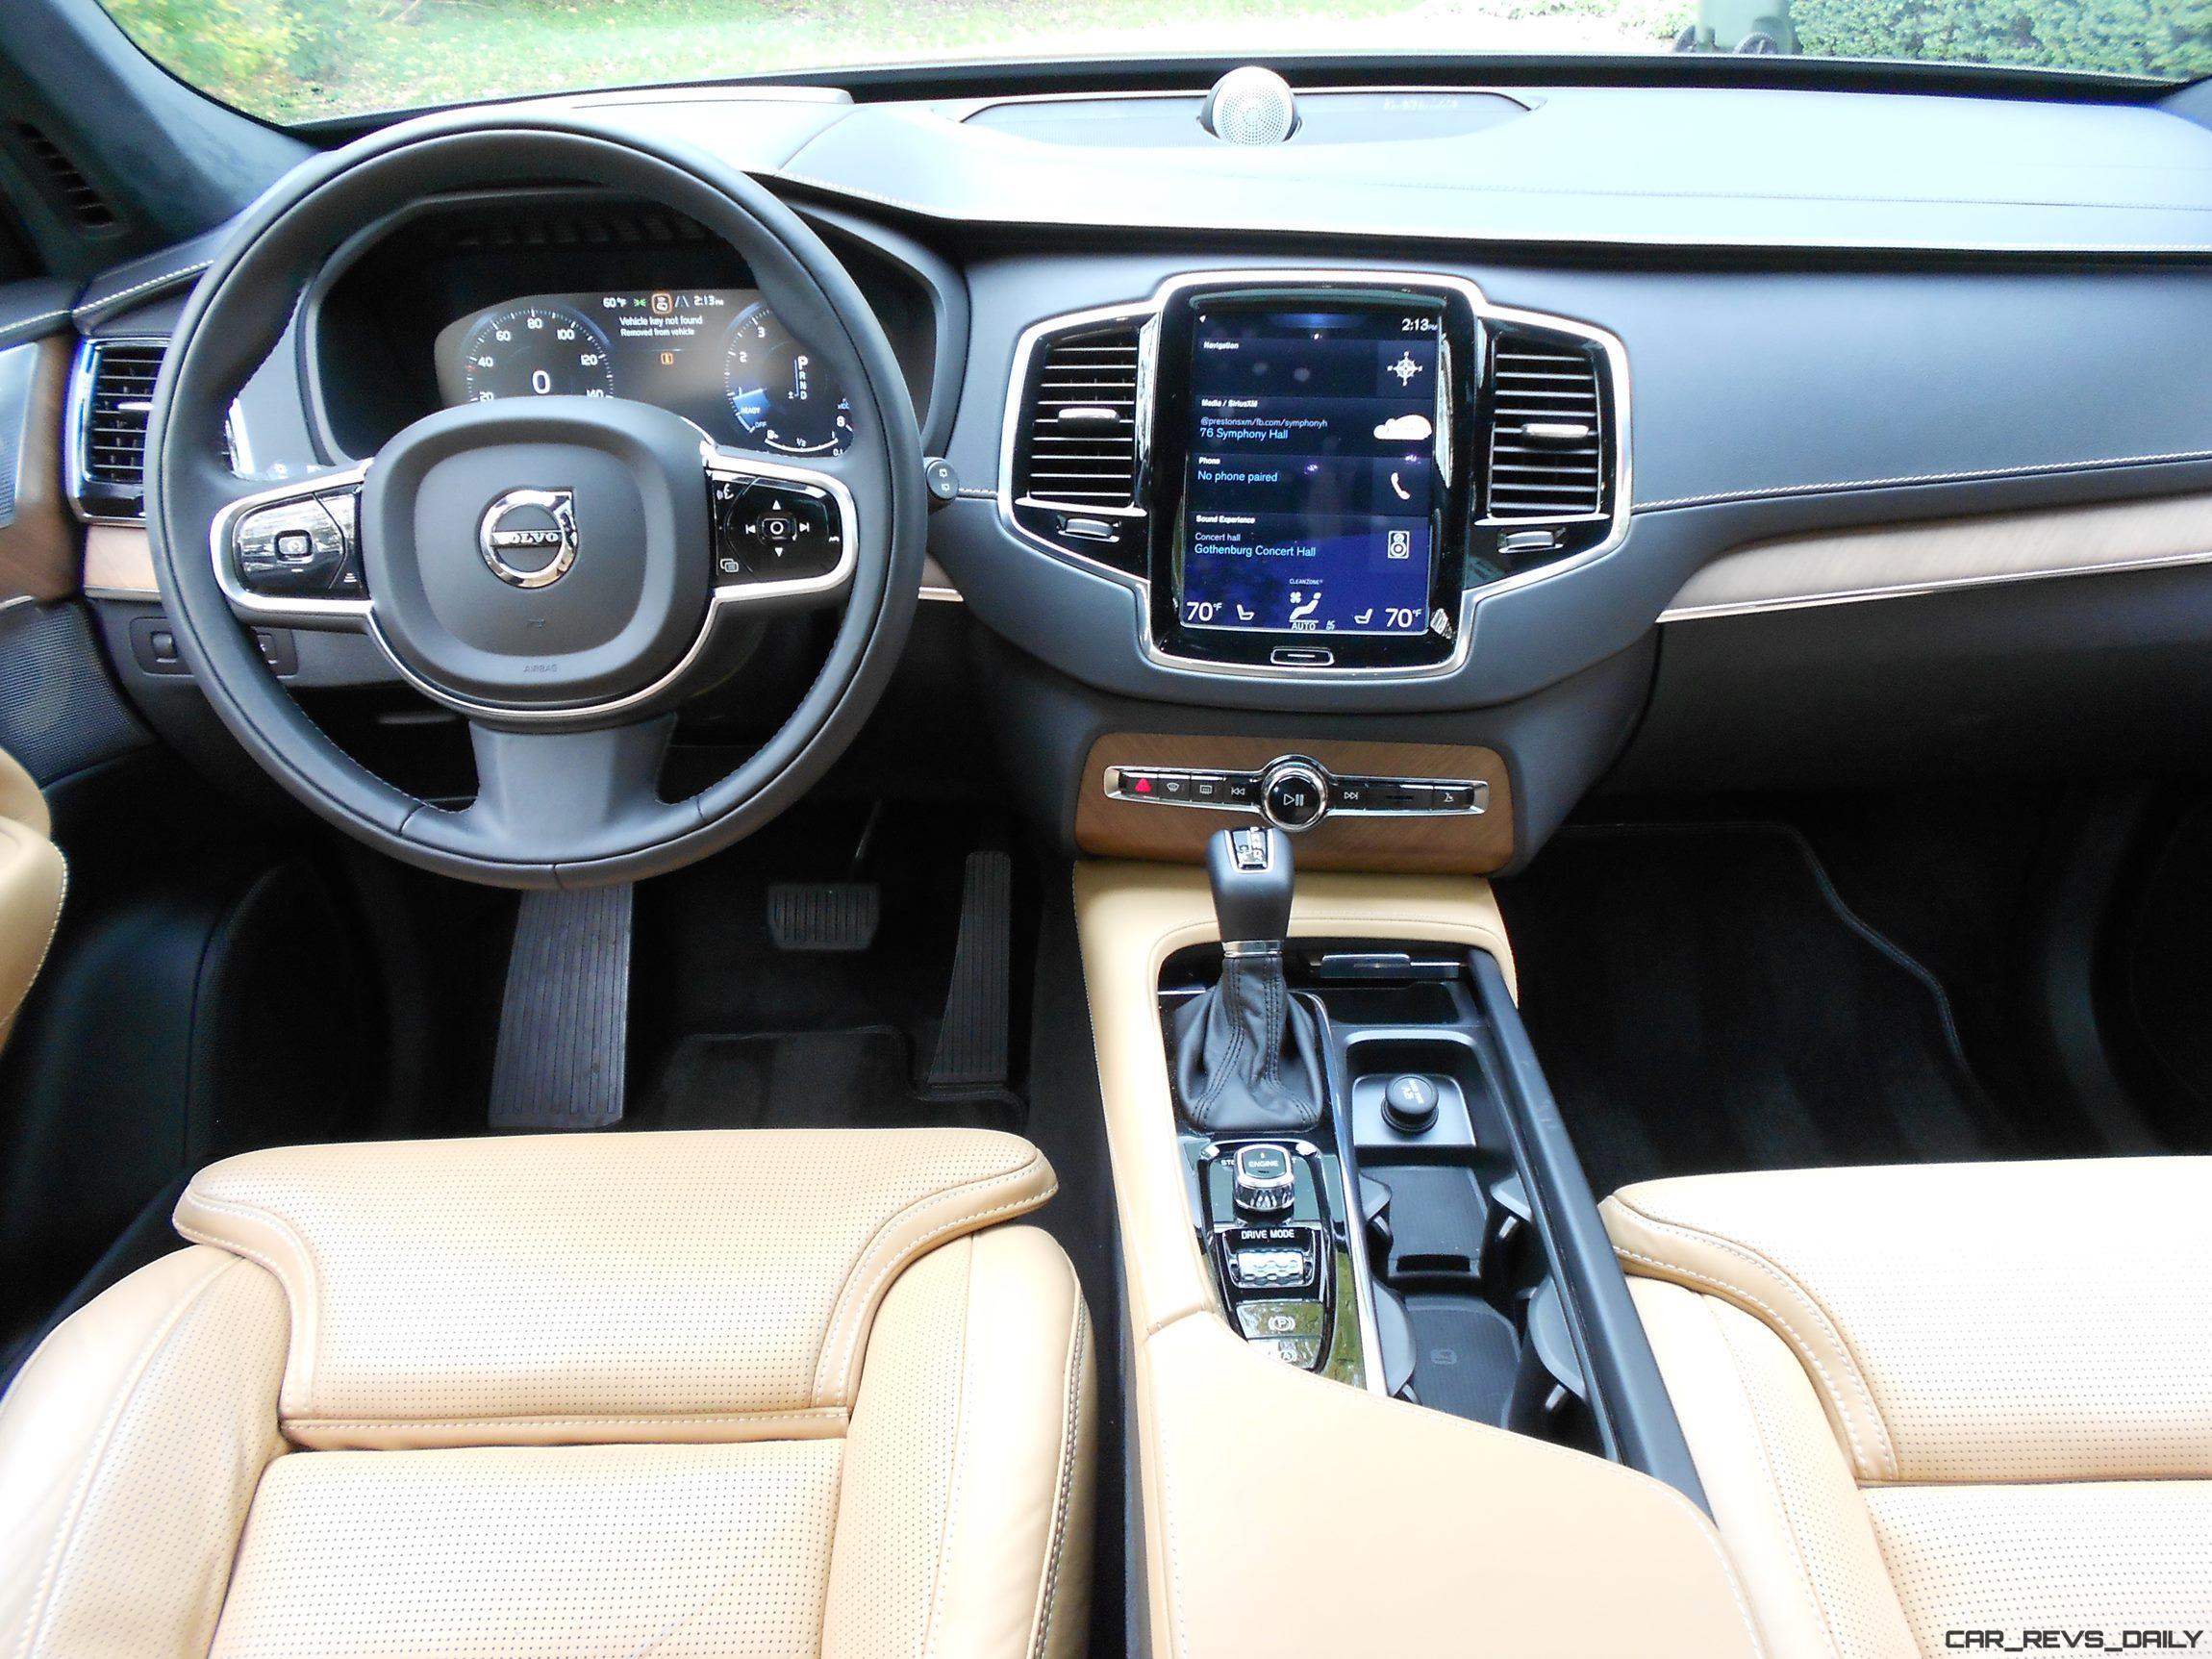 2017 Volvo Xc90 T6 Inscription Awd Interior Photos 4